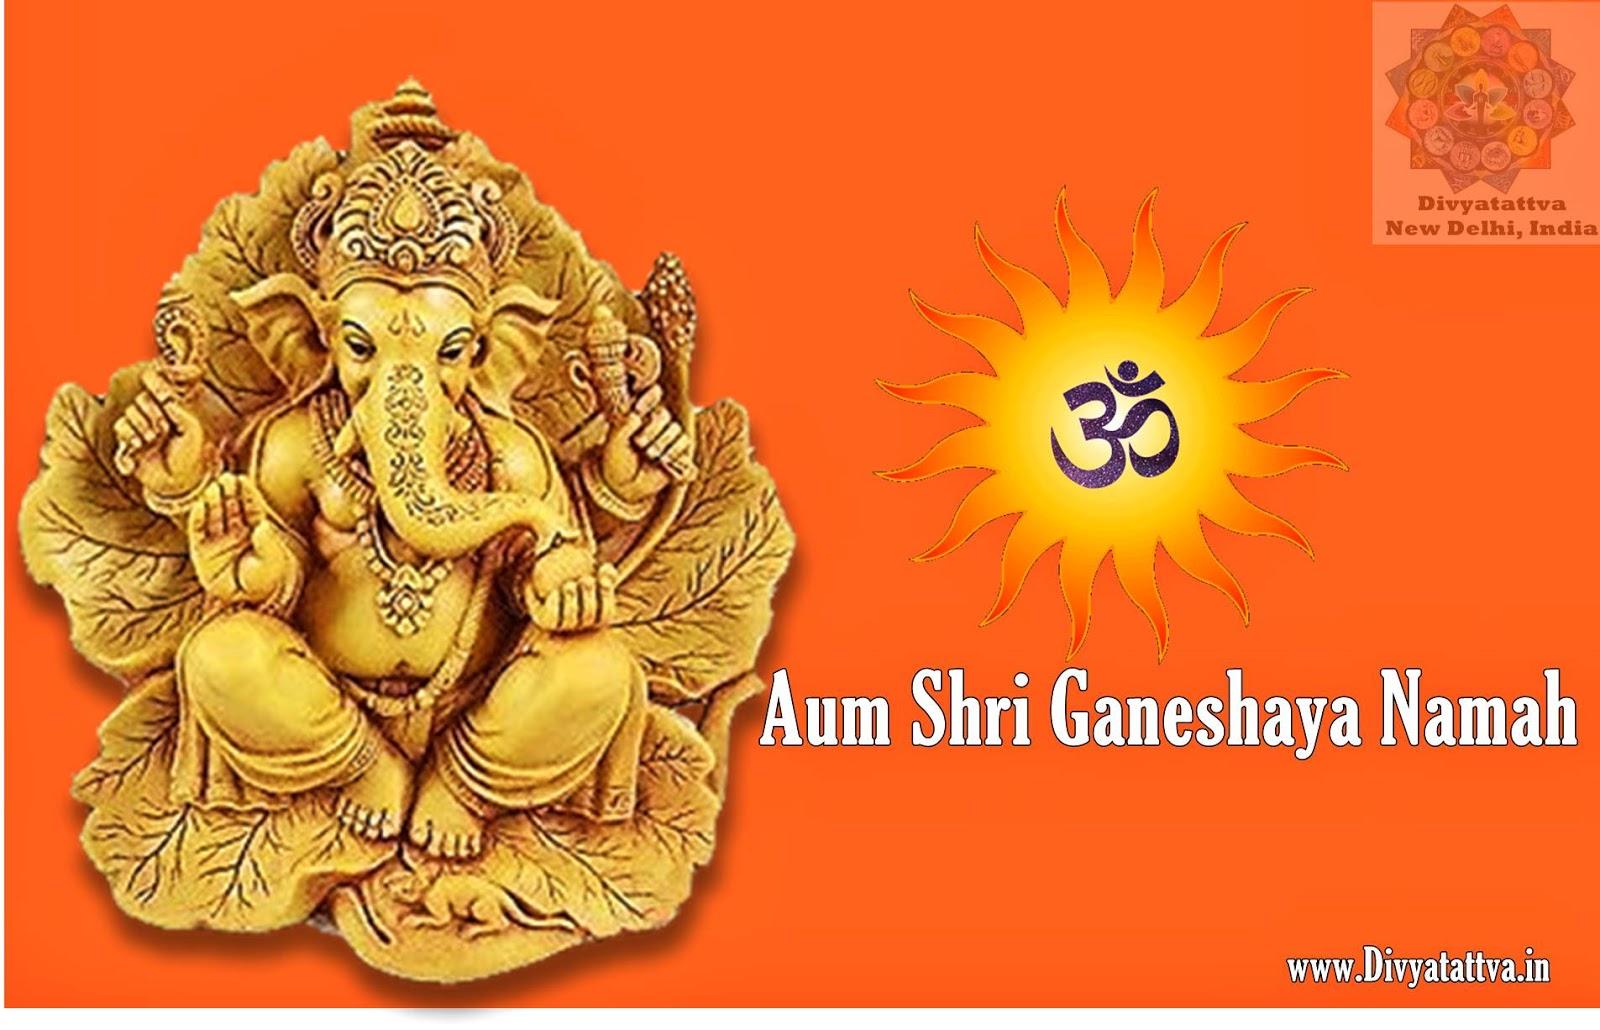 Divyatattva Astrology Free Horoscopes Psychic Tarot Yoga Tantra Occult Images Videos Lord Ganesha Hd Background Images Ganapati Bappa Wallpapers Full